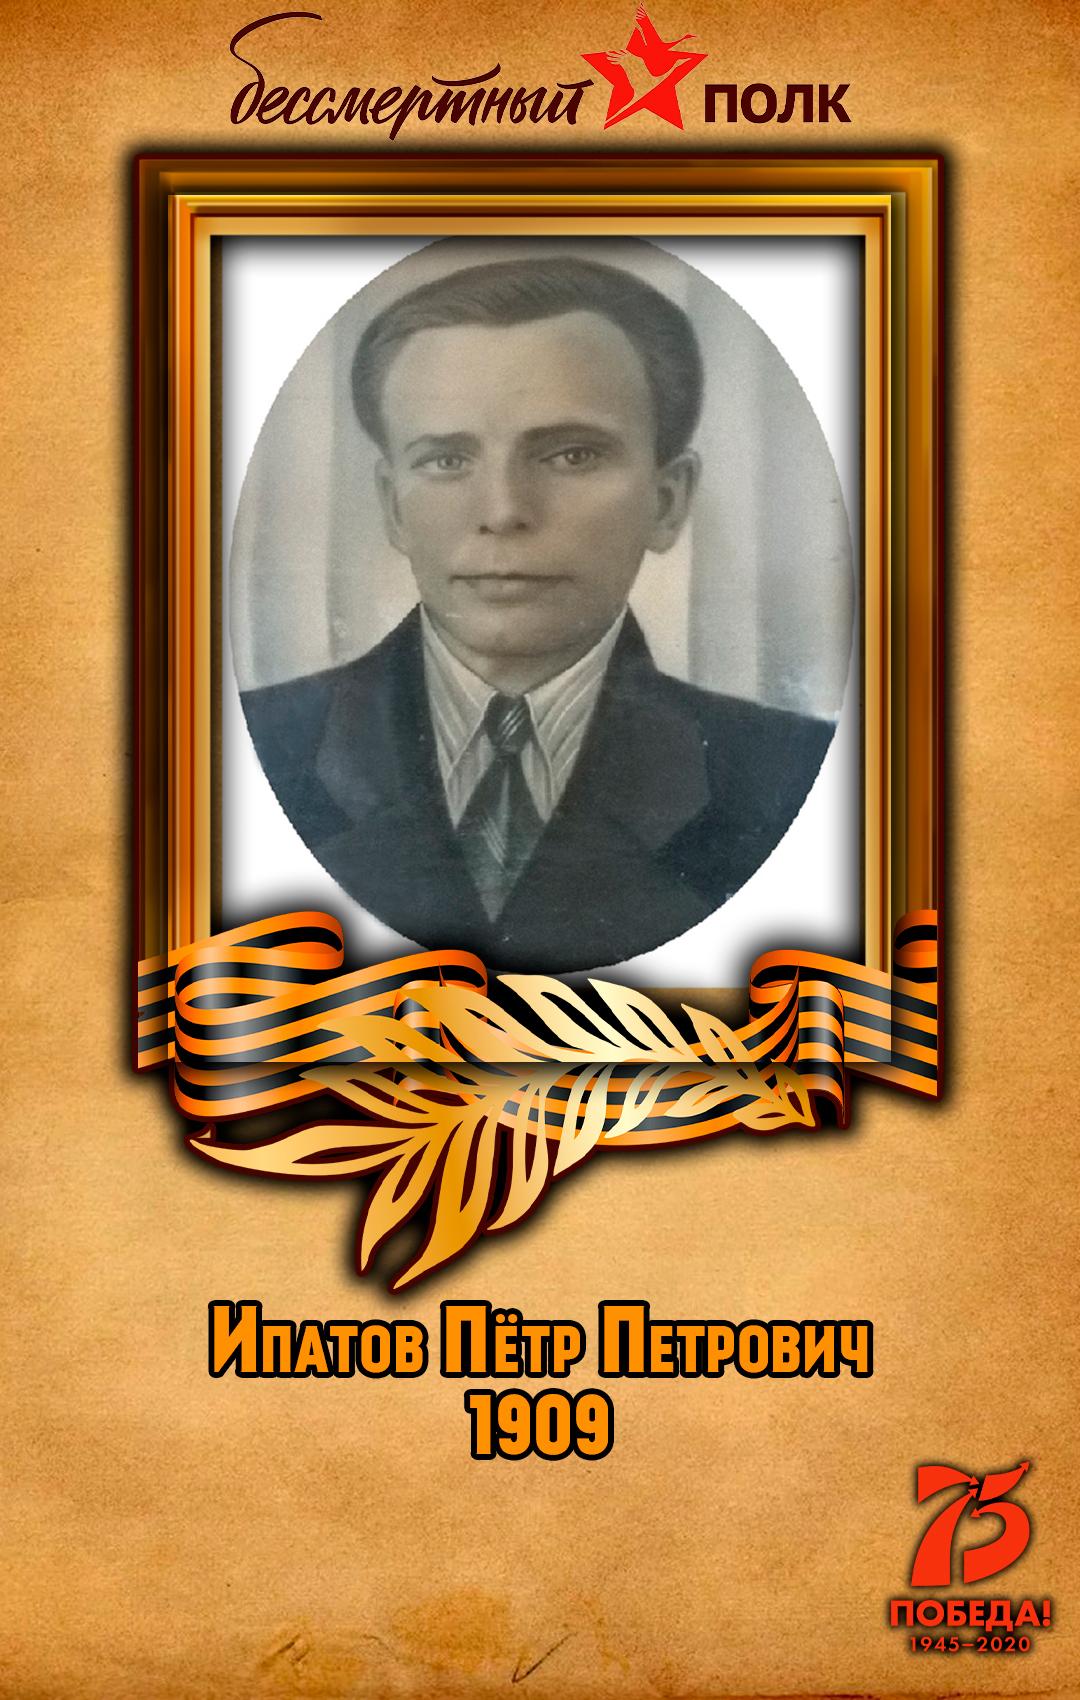 Ипатов-Пётр-Петрович